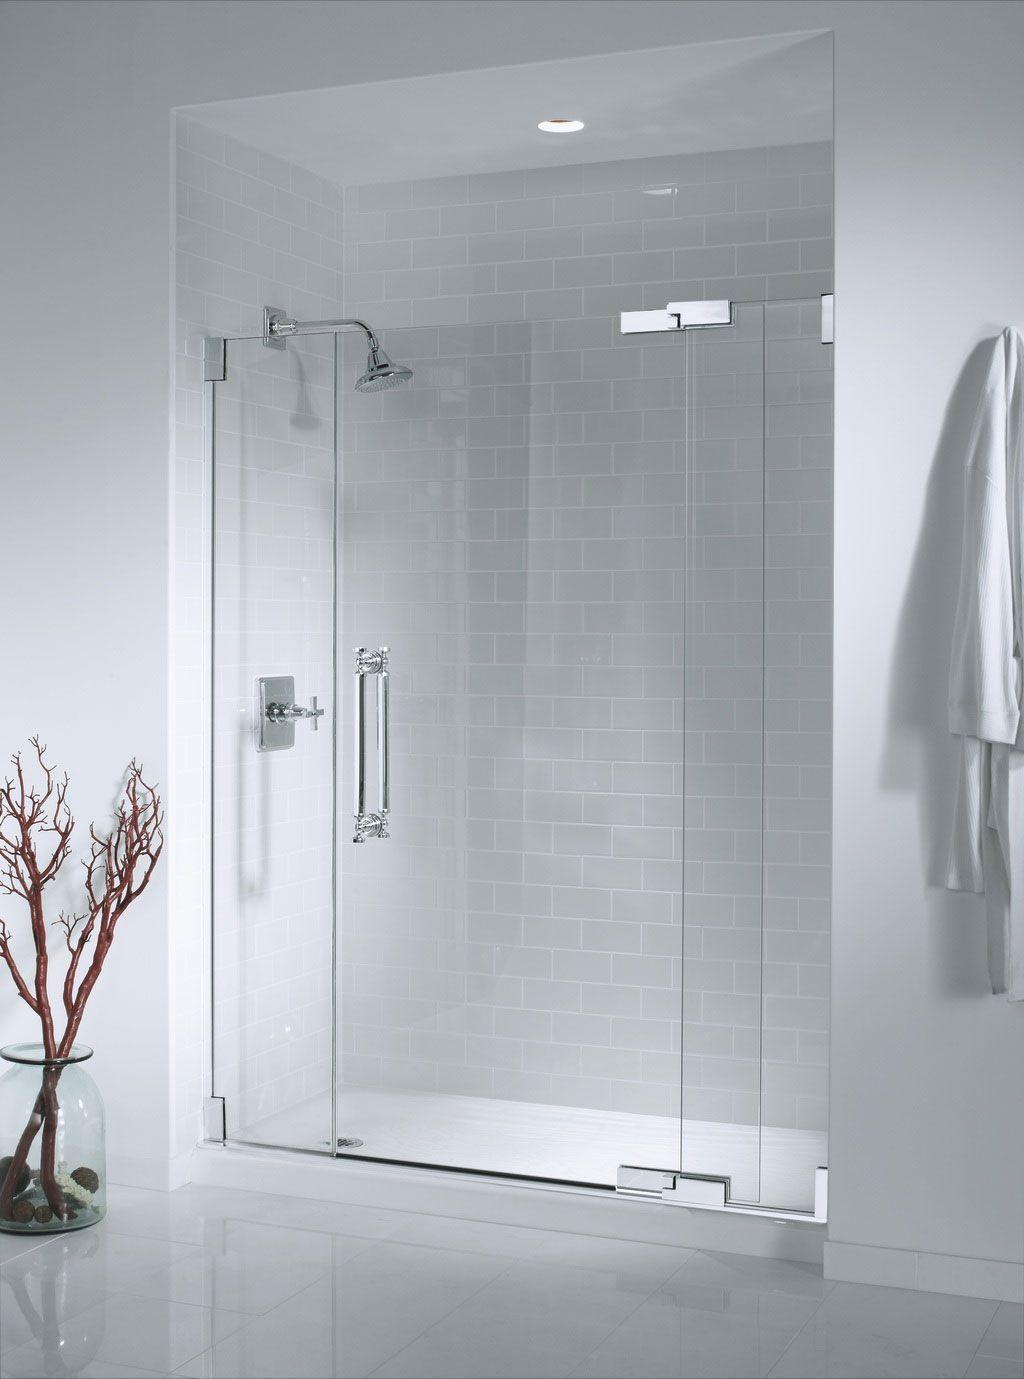 Bathroom interior glass shower doors the affection of modernity bathroom interior glass shower doors the affection of modernity nice glass shower doors planetlyrics Gallery